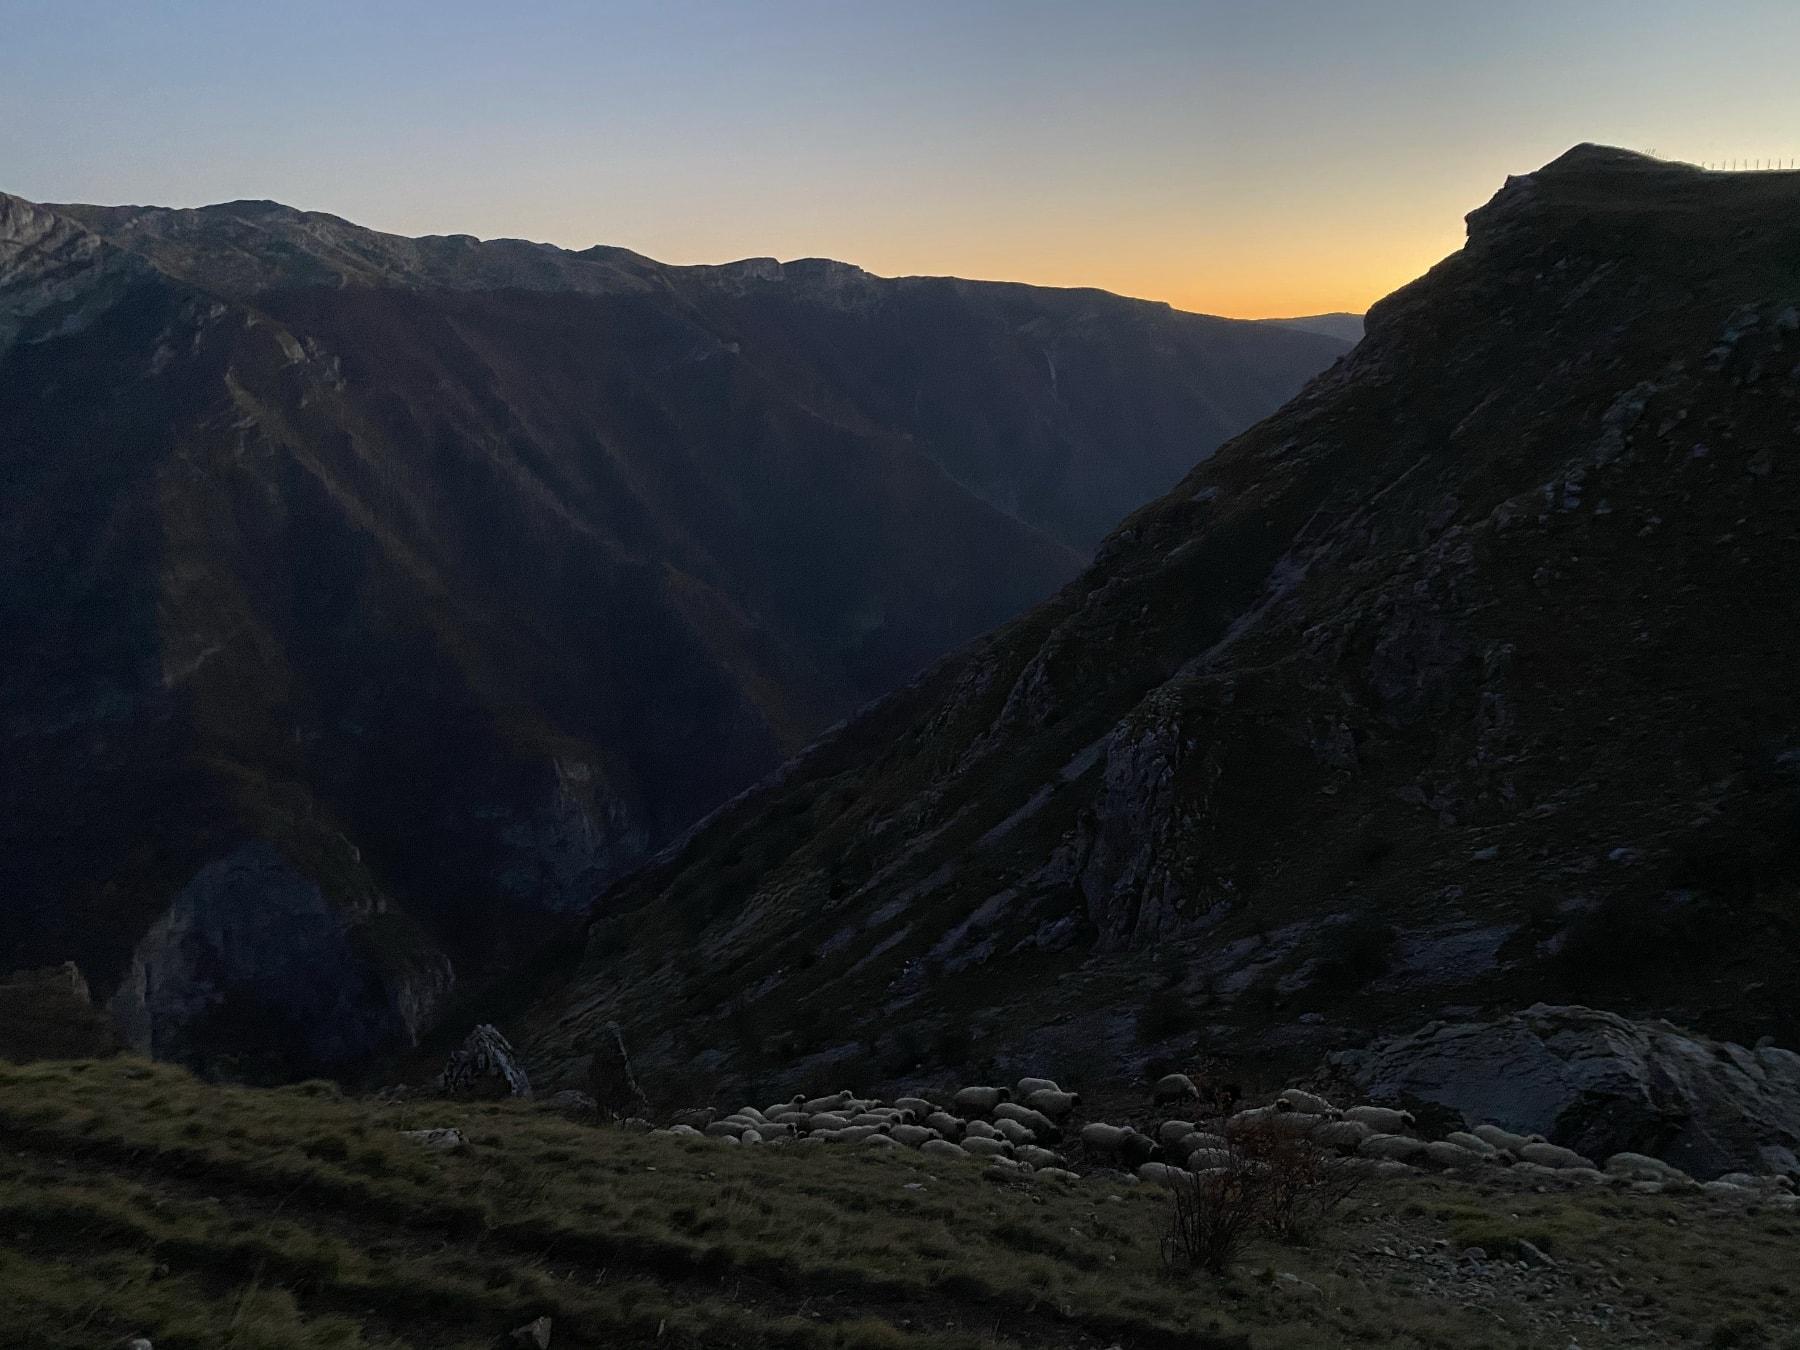 So close to heaven - In The Mountain Village Lukomir 15